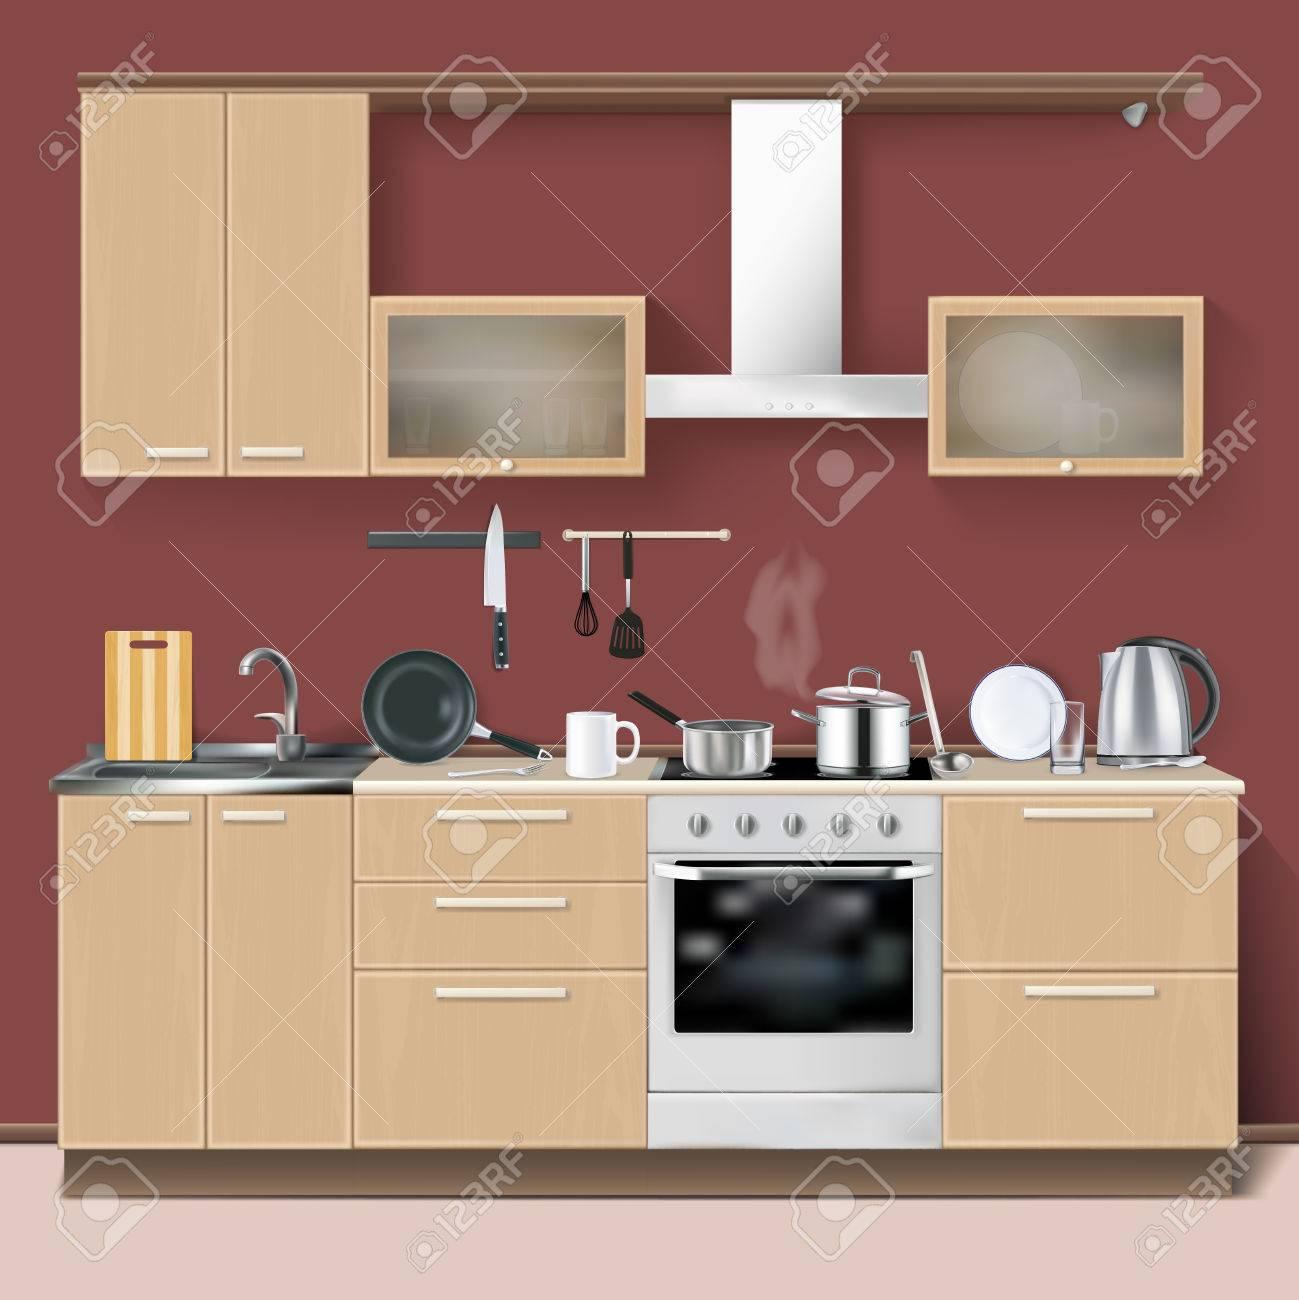 Cocina Realista Entre El Concepto De Diseño Moderno, Con Horno De ...